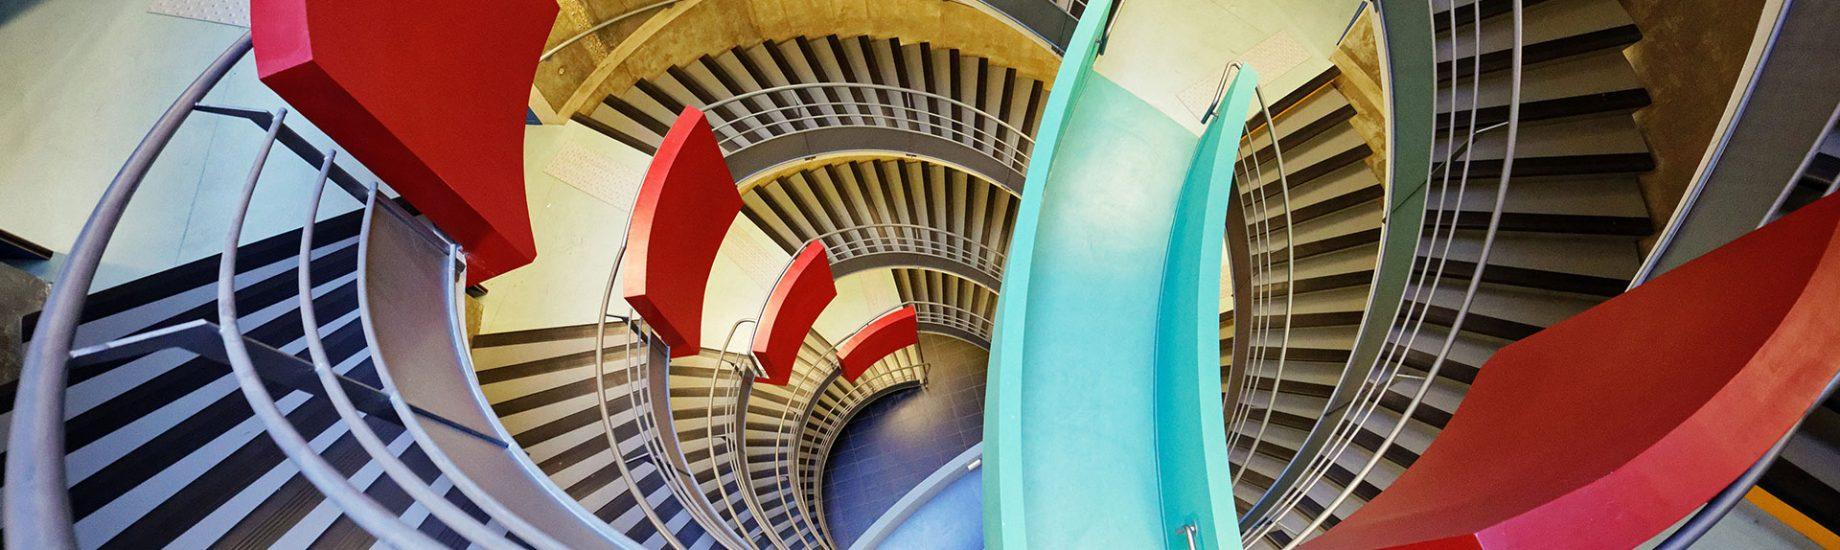 Escalier Martainville